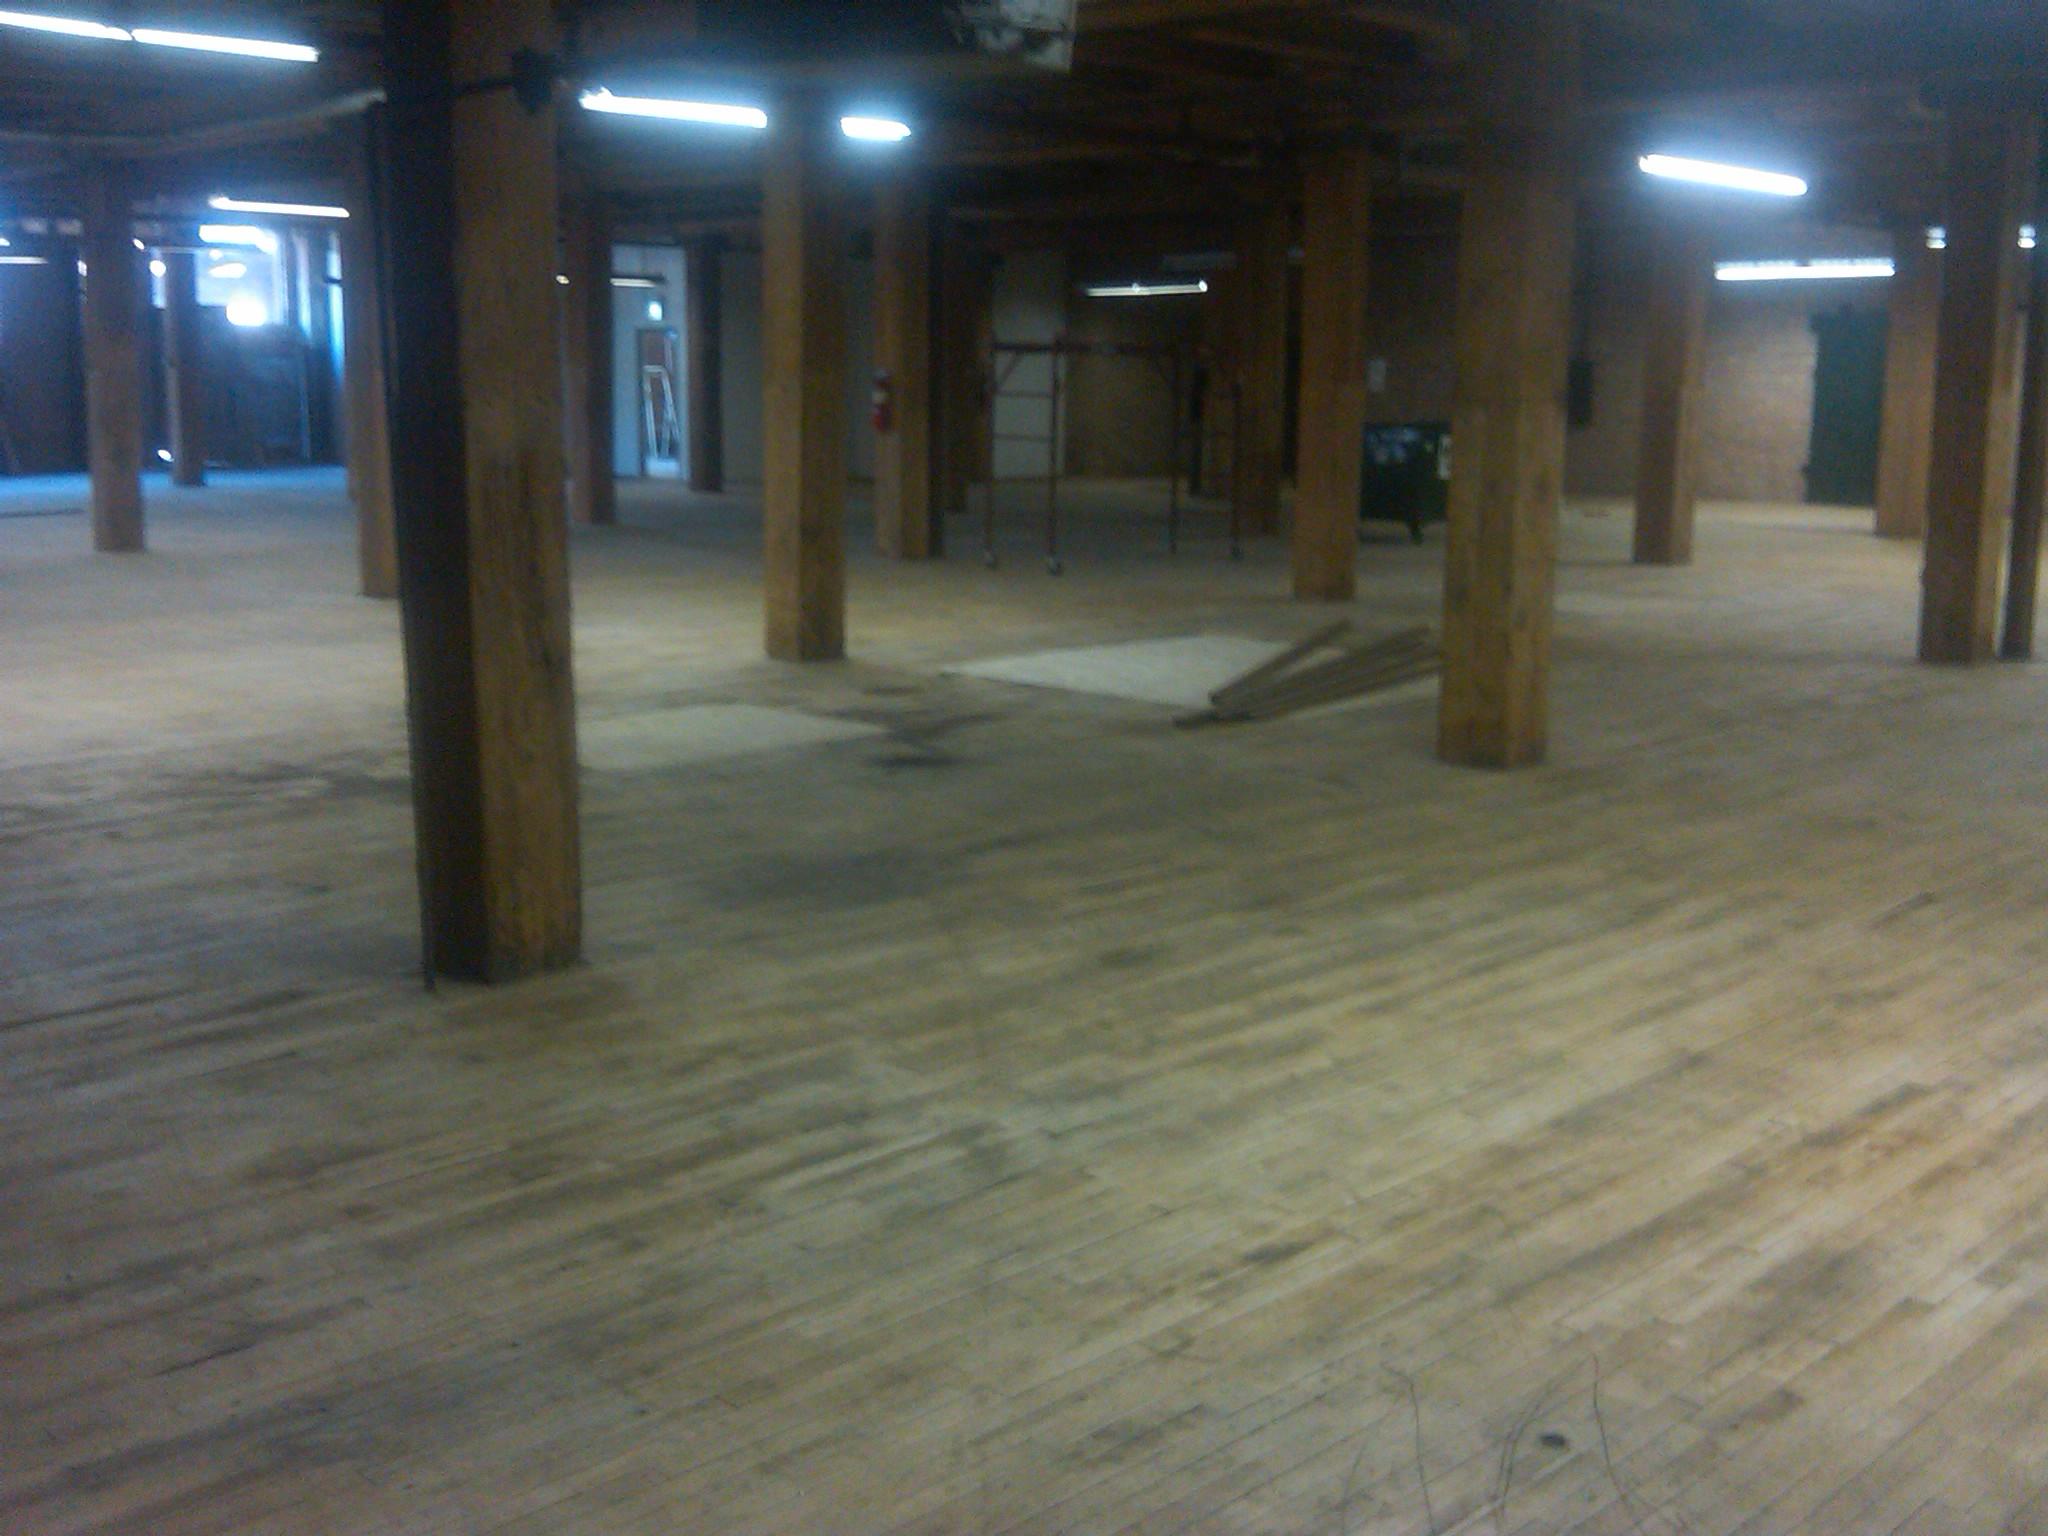 Chicago Hardwood Flooring chicago hardwood flooring chicago flooring hardwood floors chicago chicago hardwood flooring services South Side Chicago Warehouse Maple Hardwood Floor